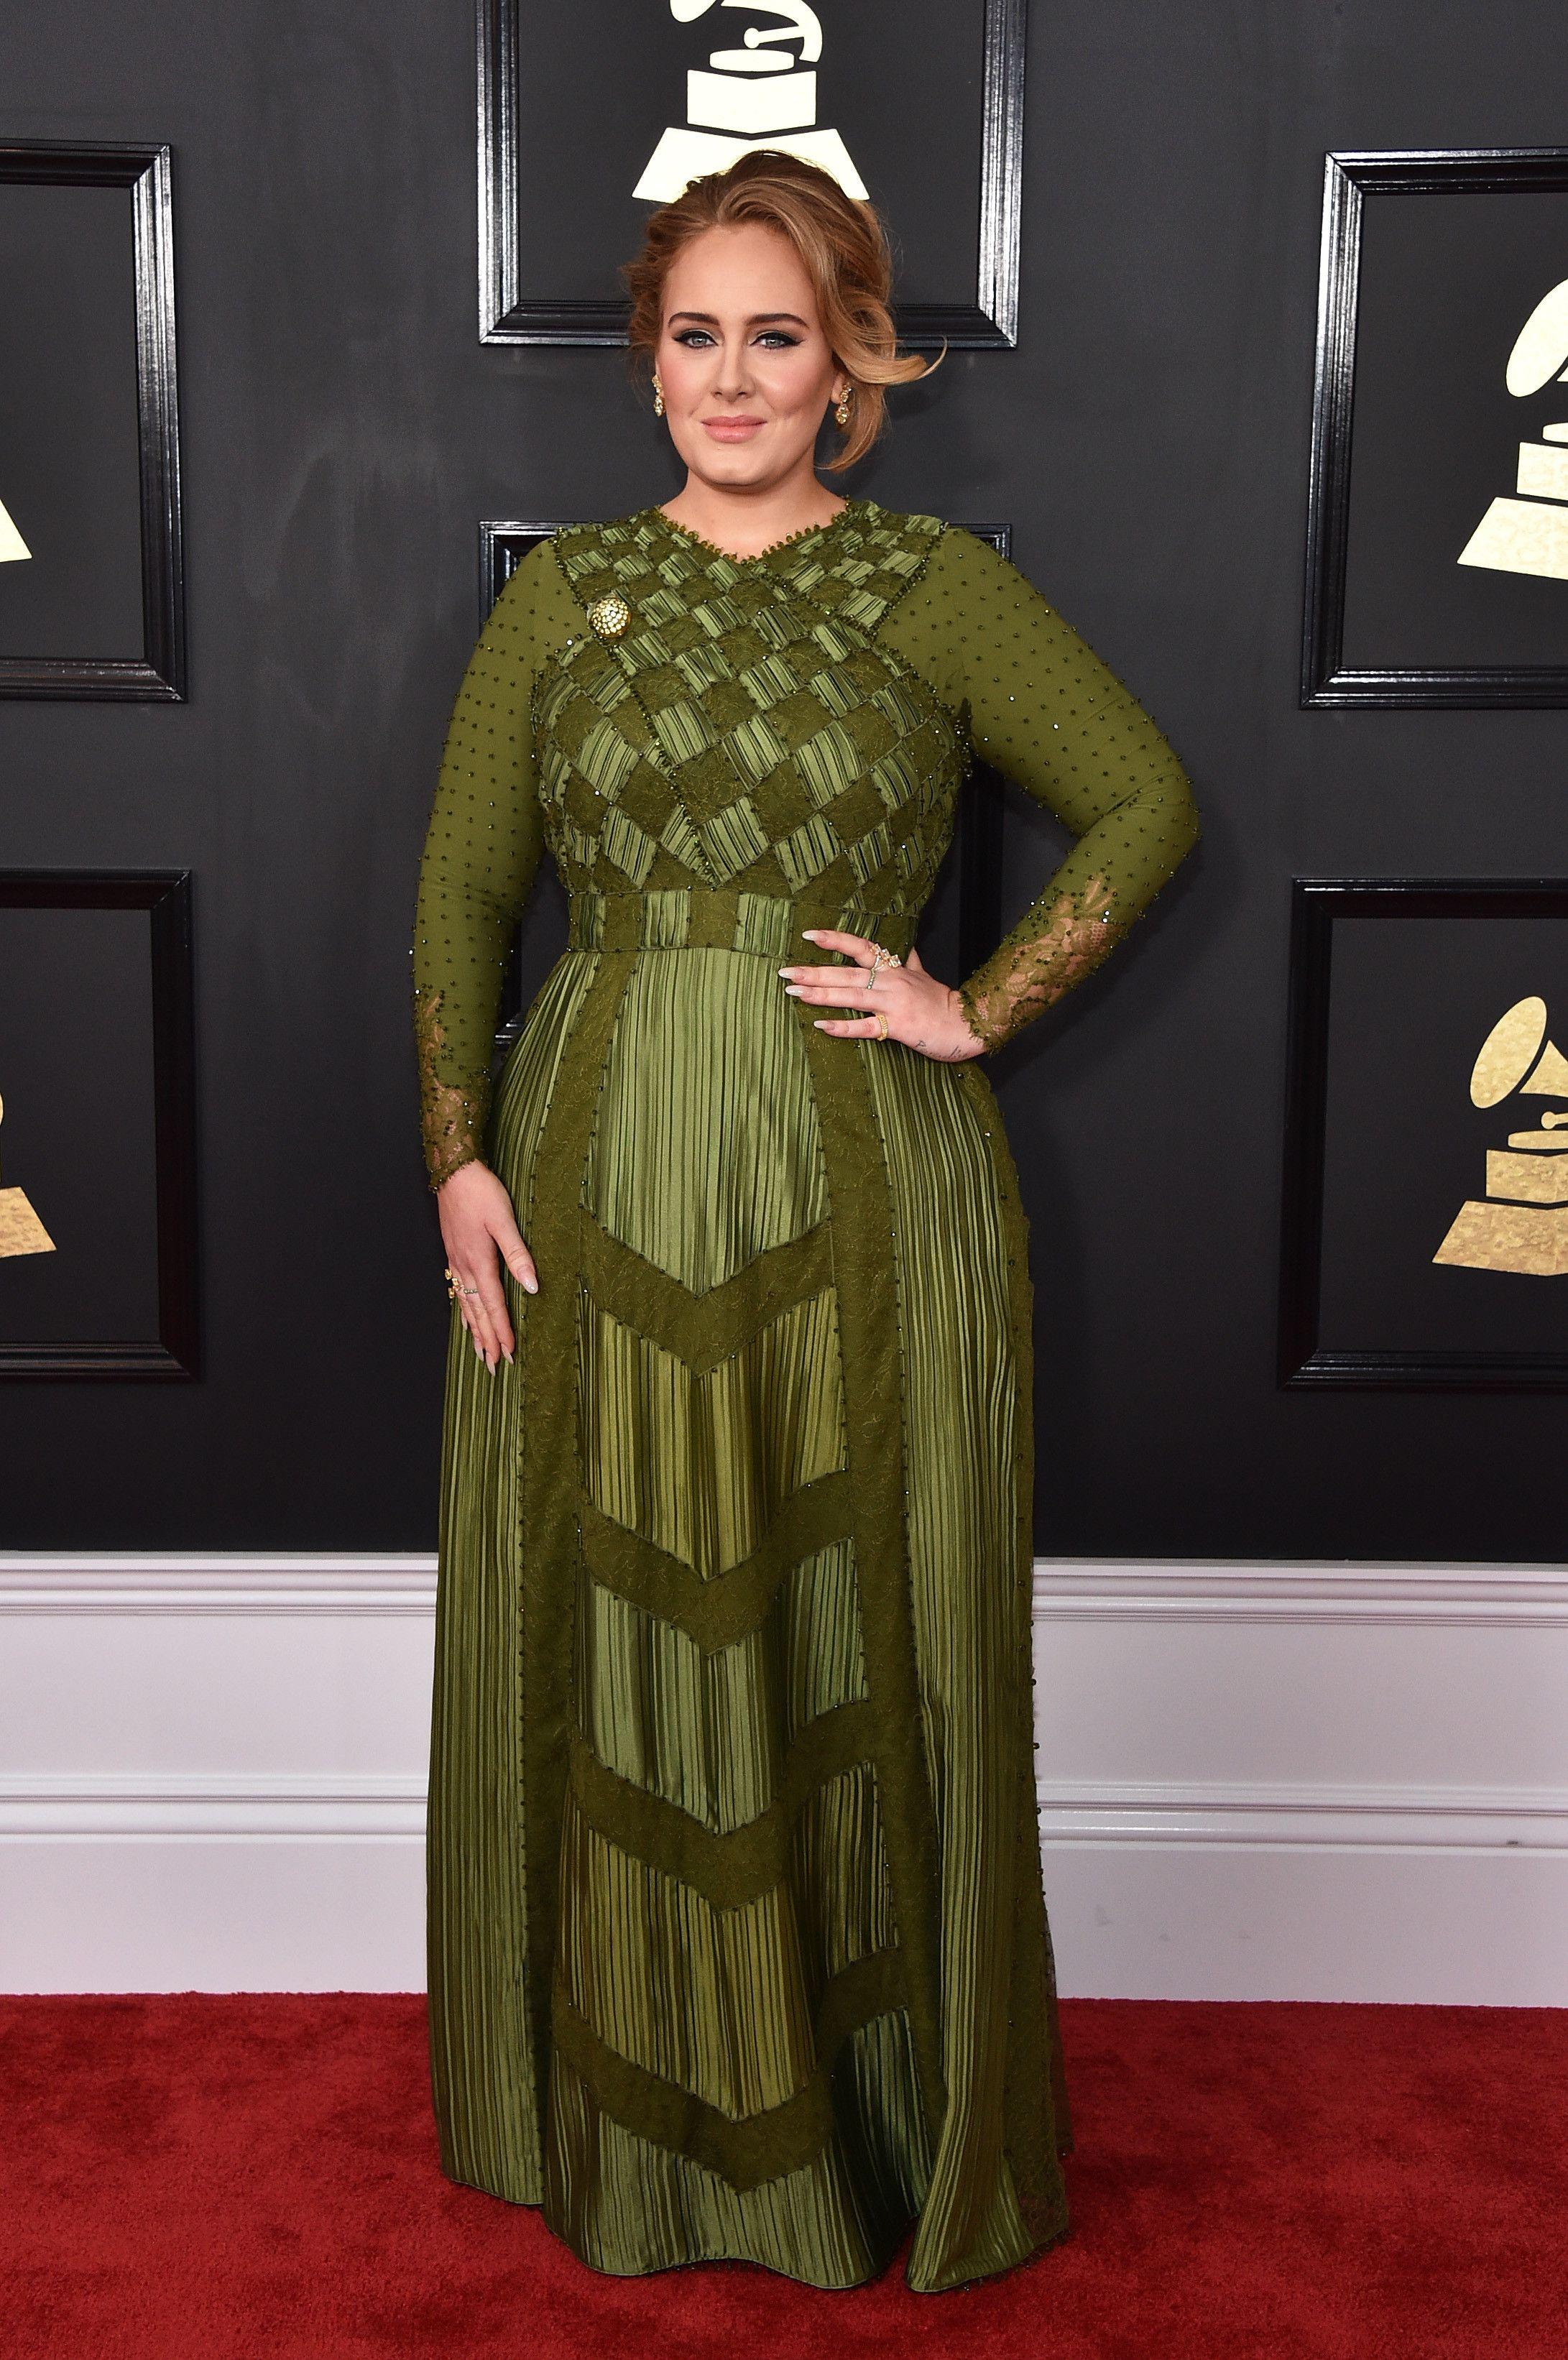 Grammy Awards 2017 The Red Carpet Fashion You Need To See Nice Dresses Red Carpet Dresses Red Carpet Fashion